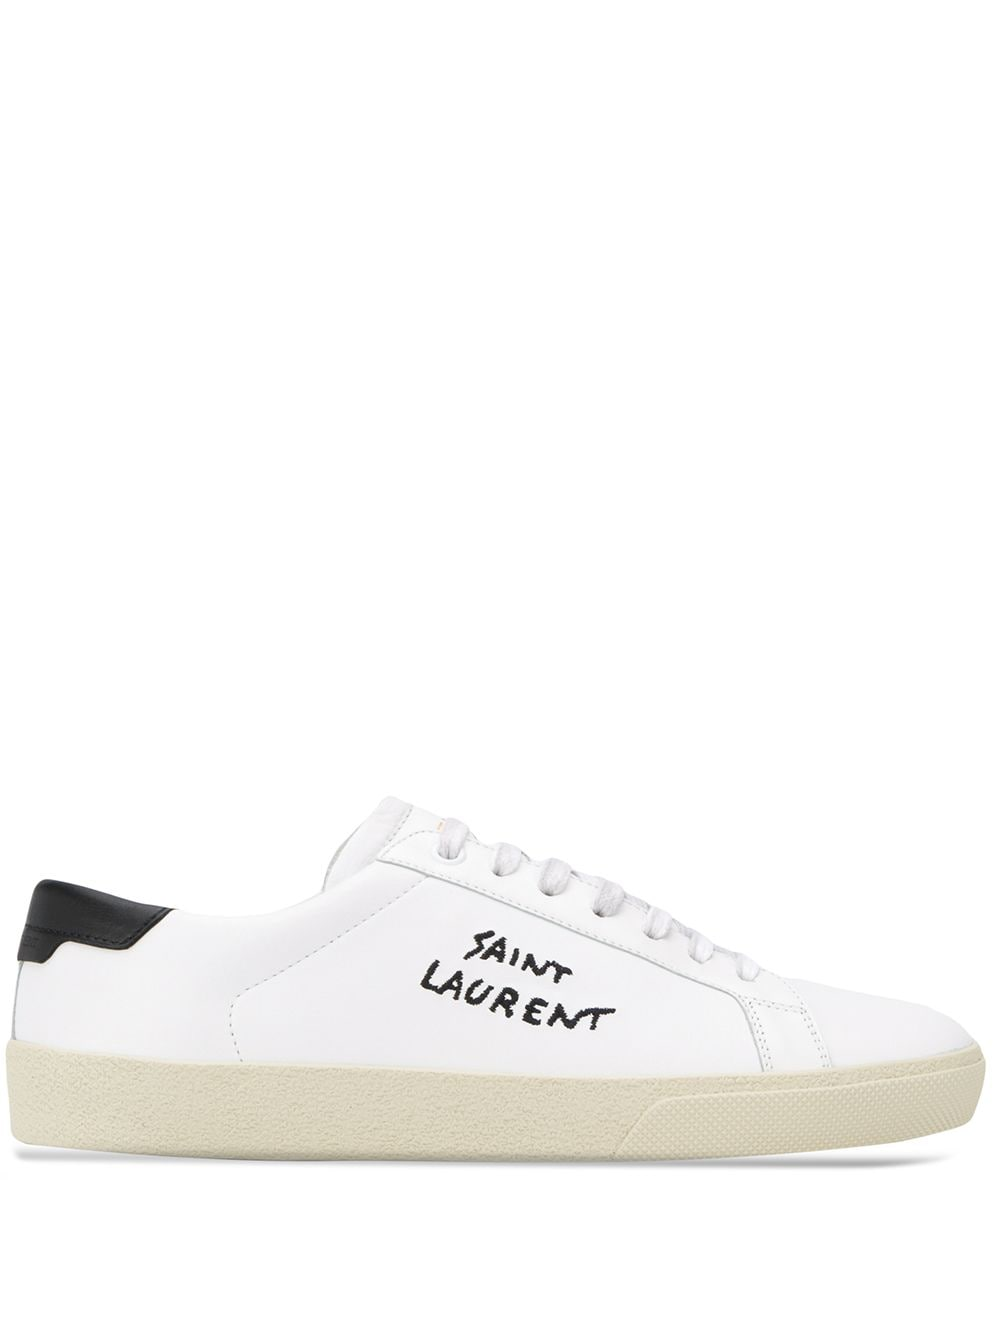 Picture of Saint Laurent | Court Classic Sl/06 Low-Top Sneakers